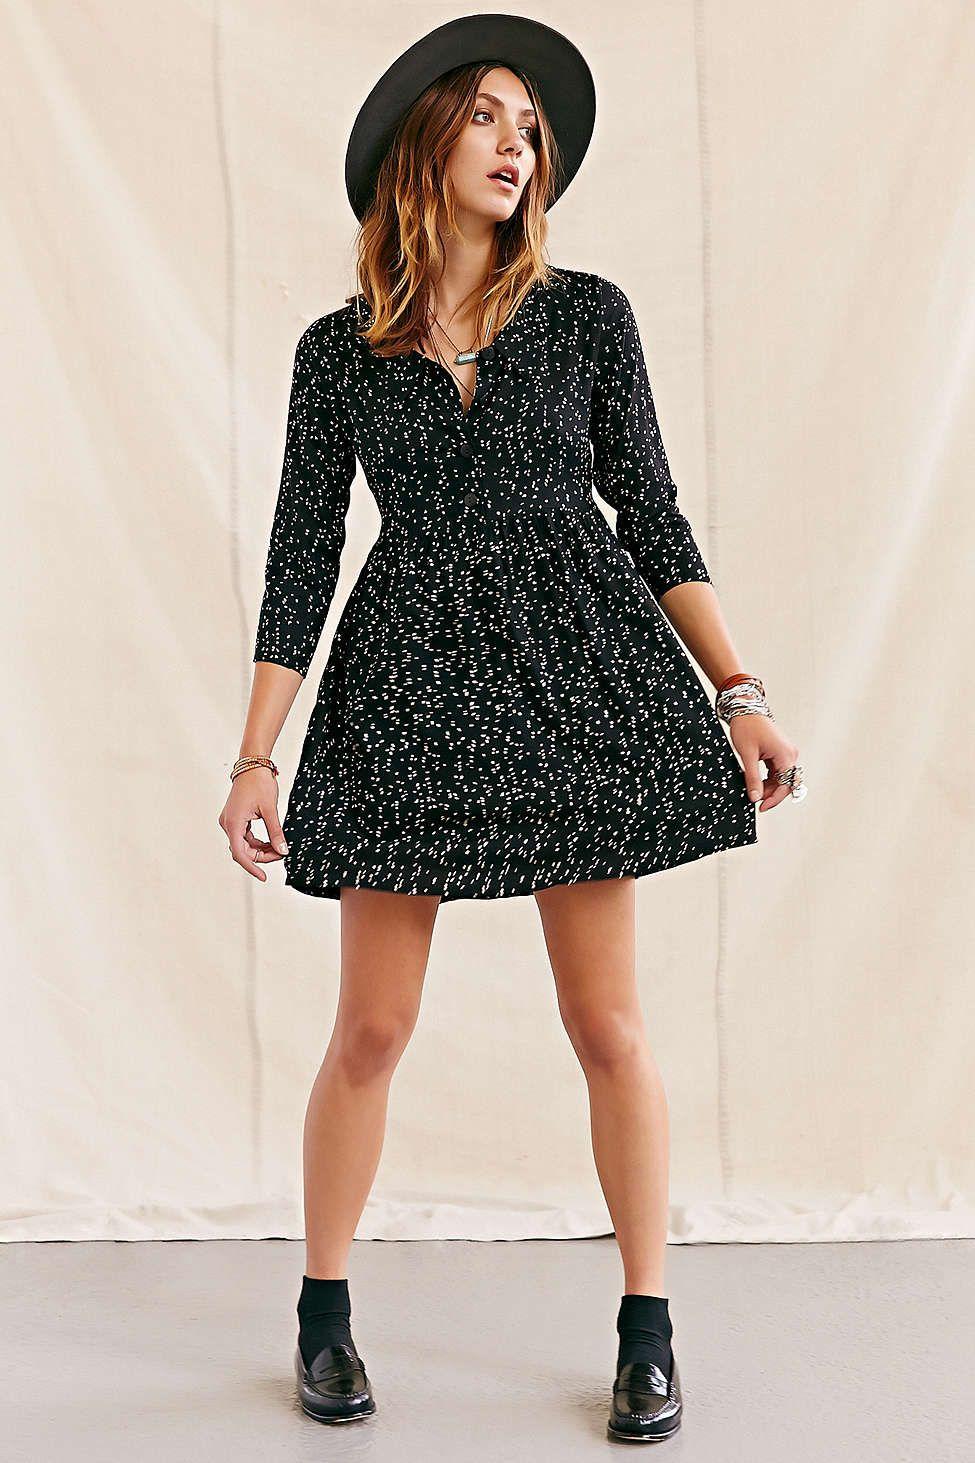 One & Only X Urban Renewal Polka Dot Dress